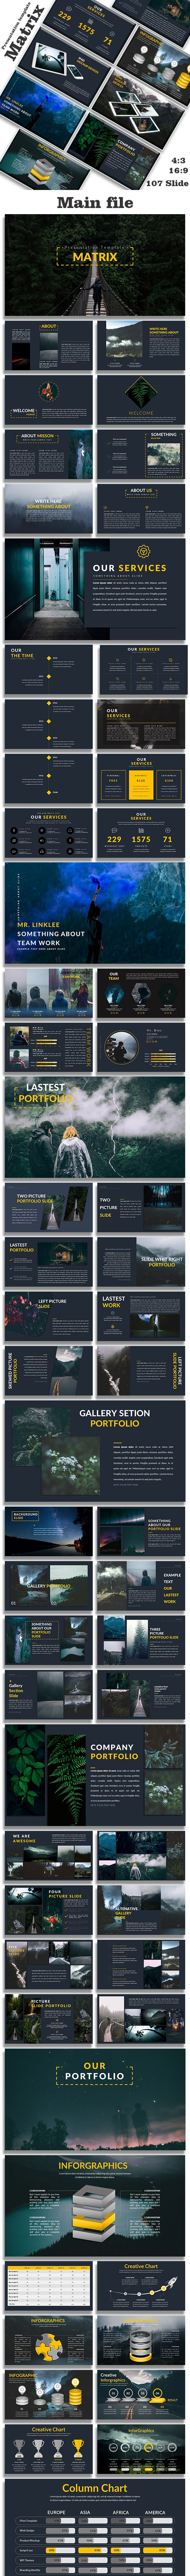 Matrix - Creative Google Slide Template - Google Slides Presentation Templates